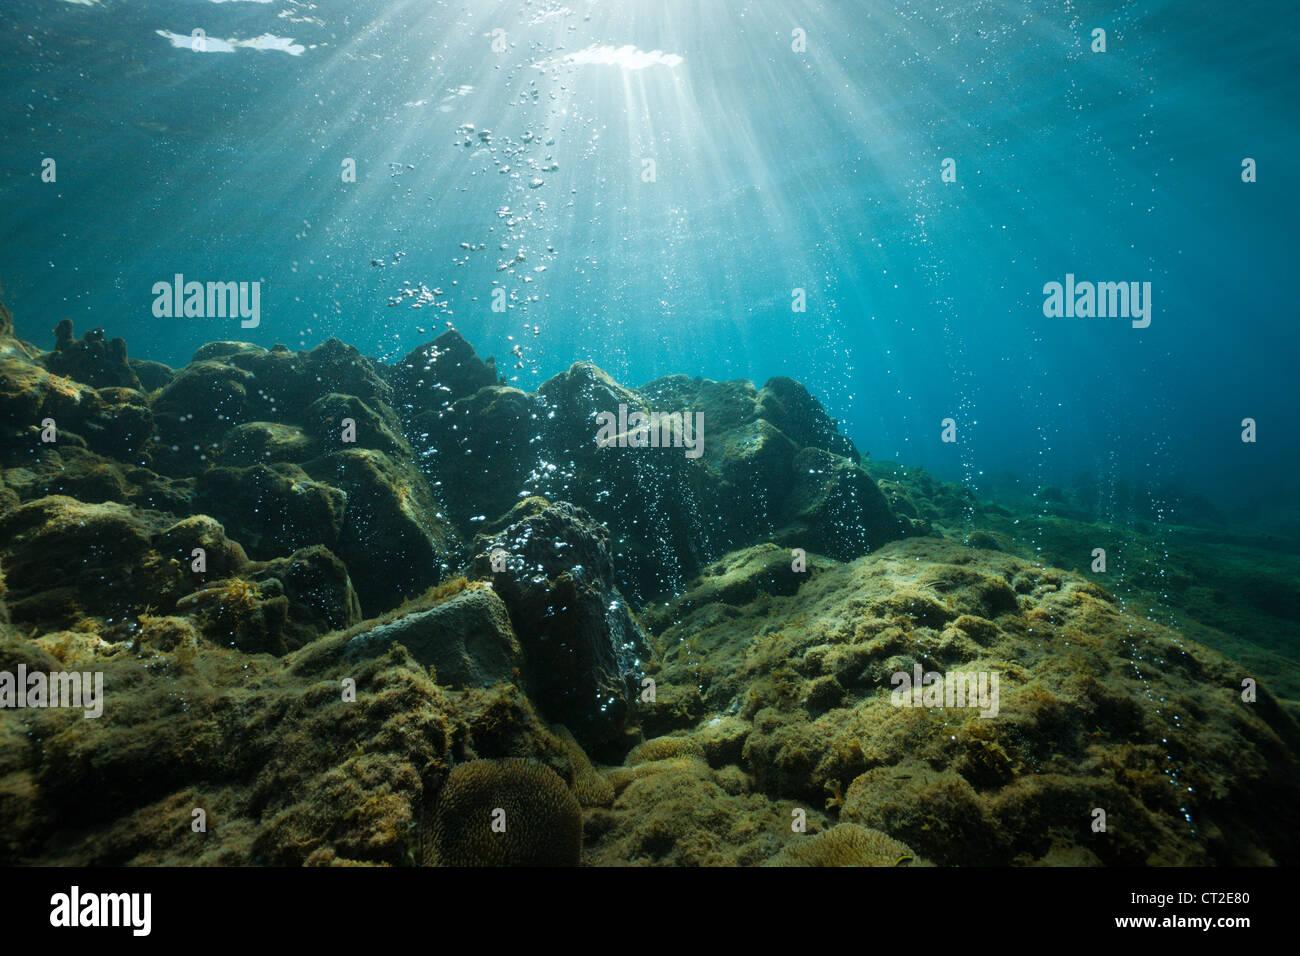 Vulcaniche di bolle di aria in spiaggia Champagne, Mar dei Caraibi, Dominica Immagini Stock